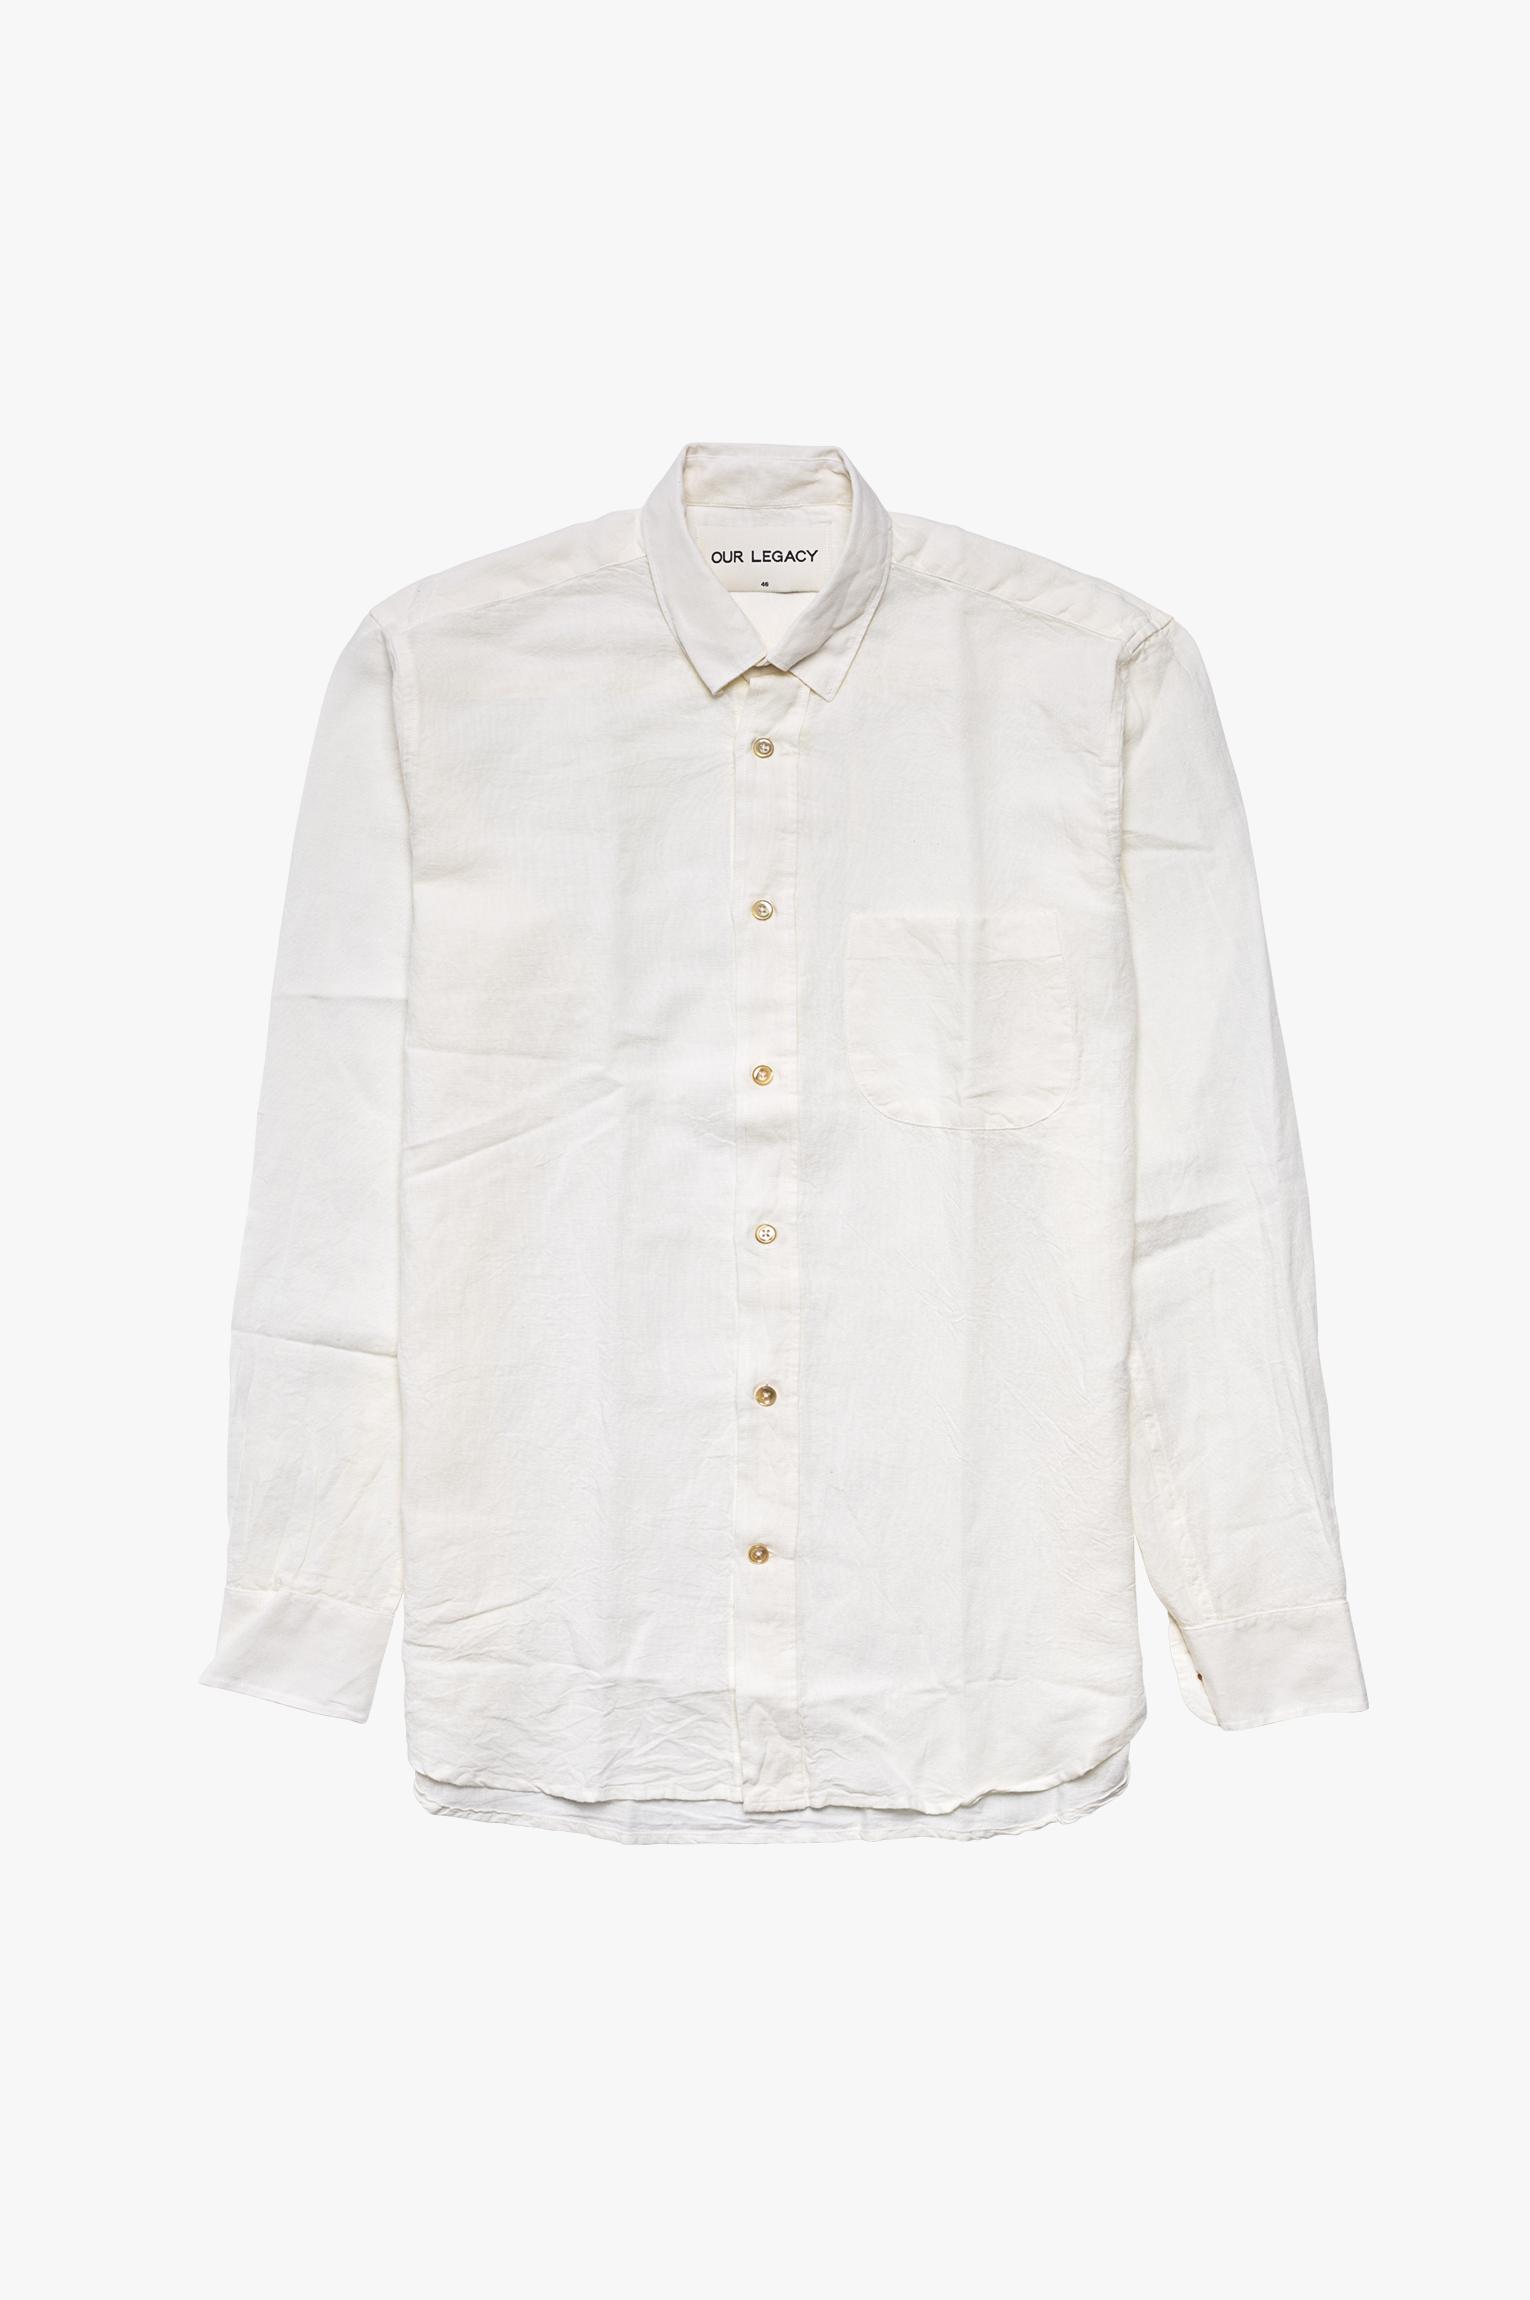 Generation Shirt White